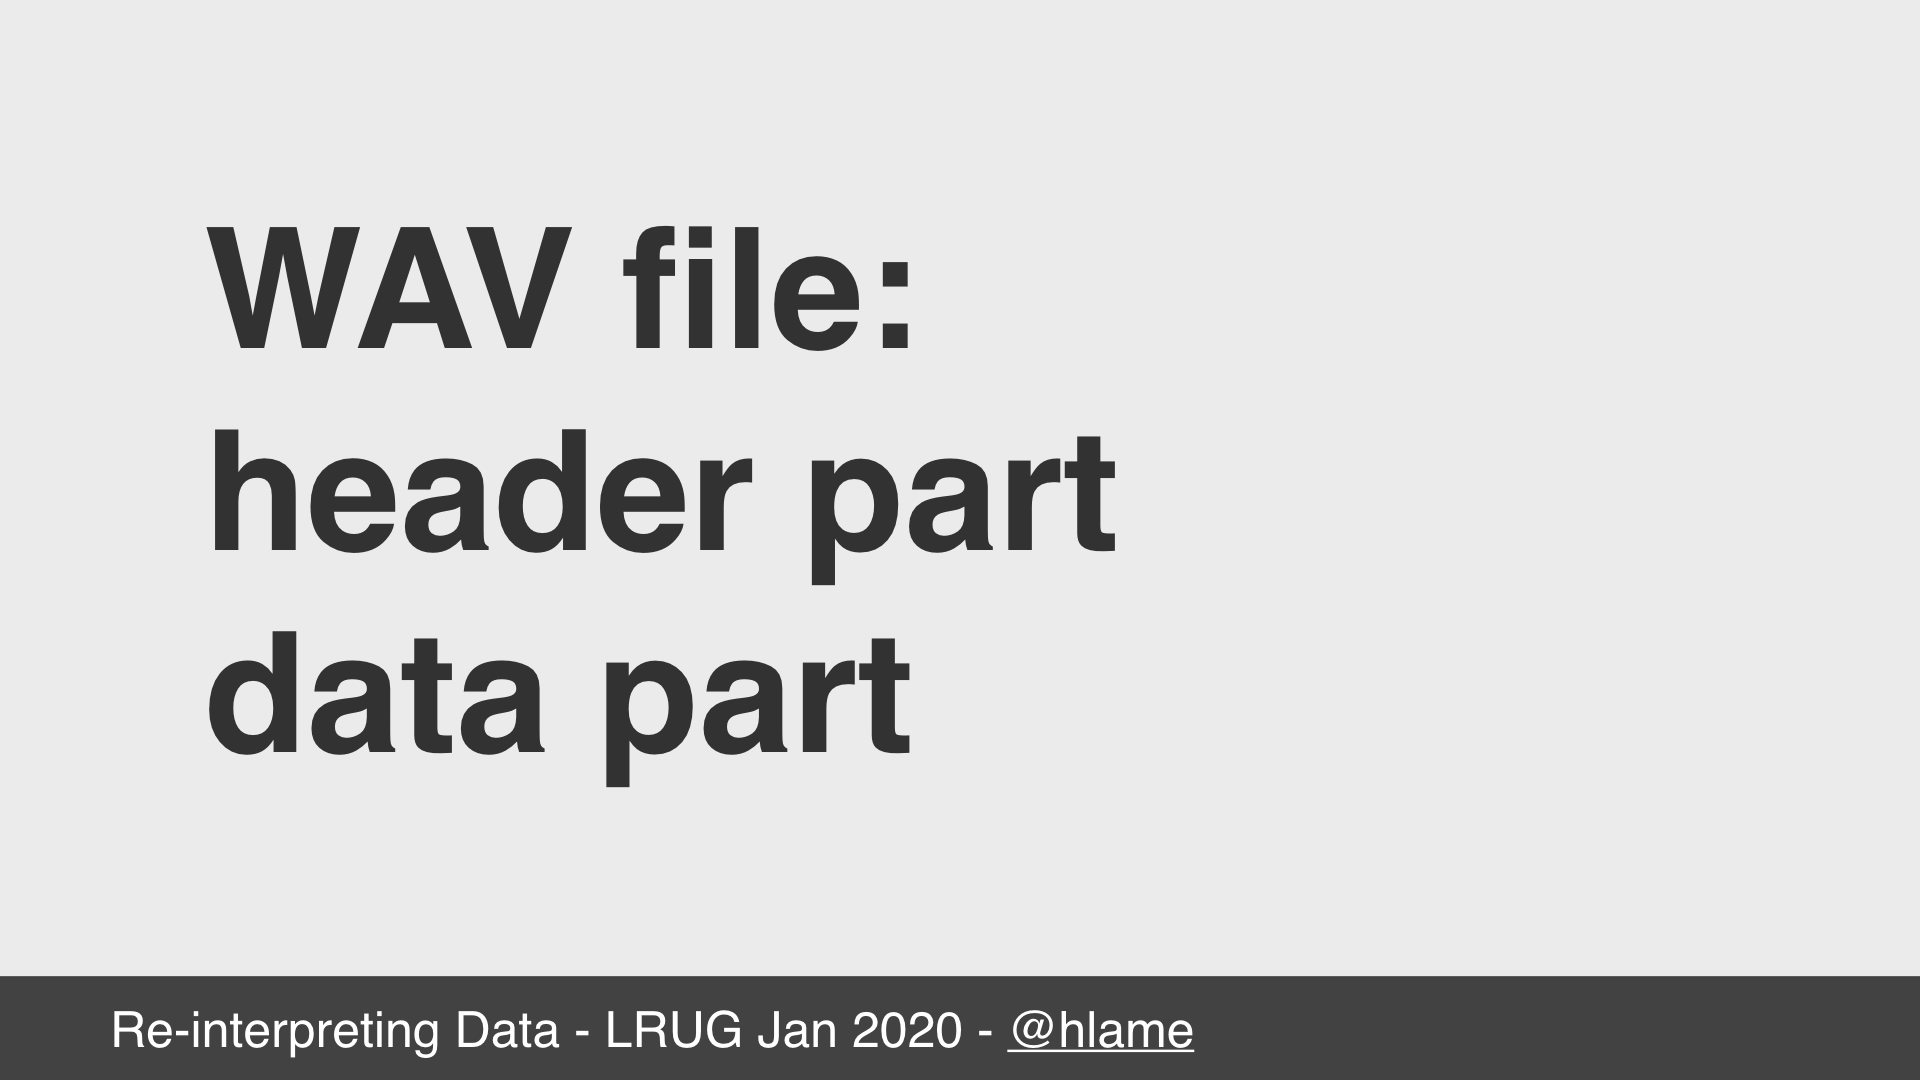 text: WAV file: header part; data part